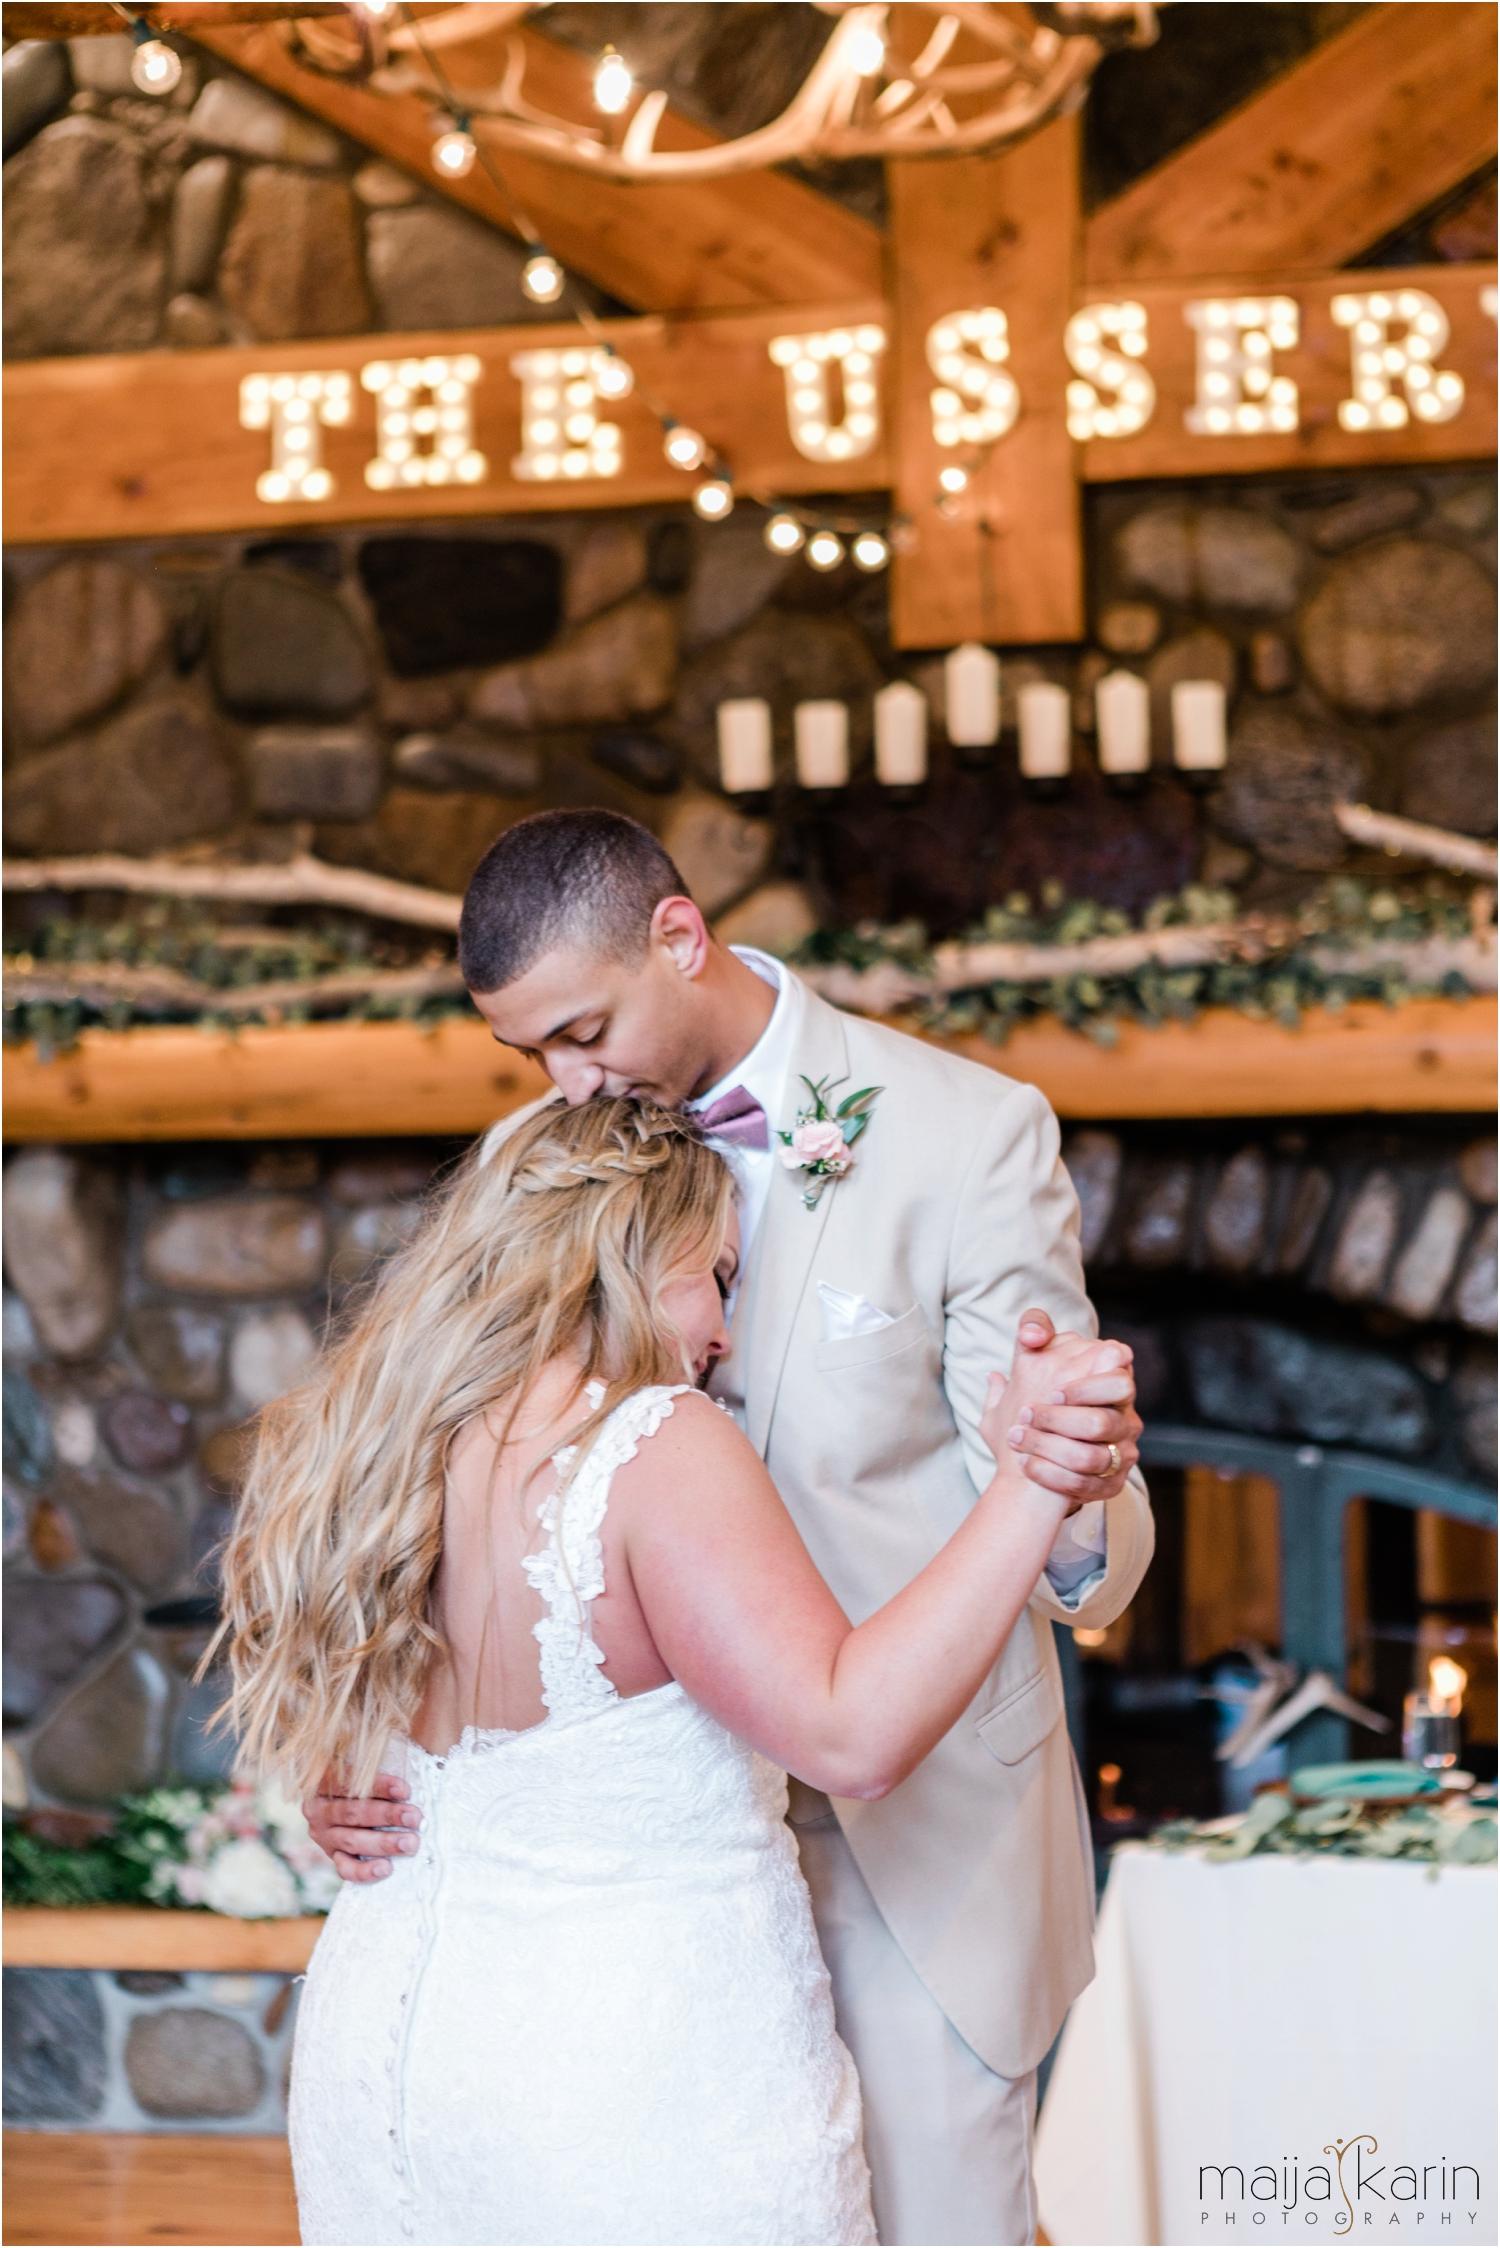 Mountain Springs Lodge wedding Maija Karin Photography%0DMaija Karin Photography%0DMaija Karin Photography%0DMountain-Springs-Lodge-Wedding-Maija-Karin-Photography_0068.jpg